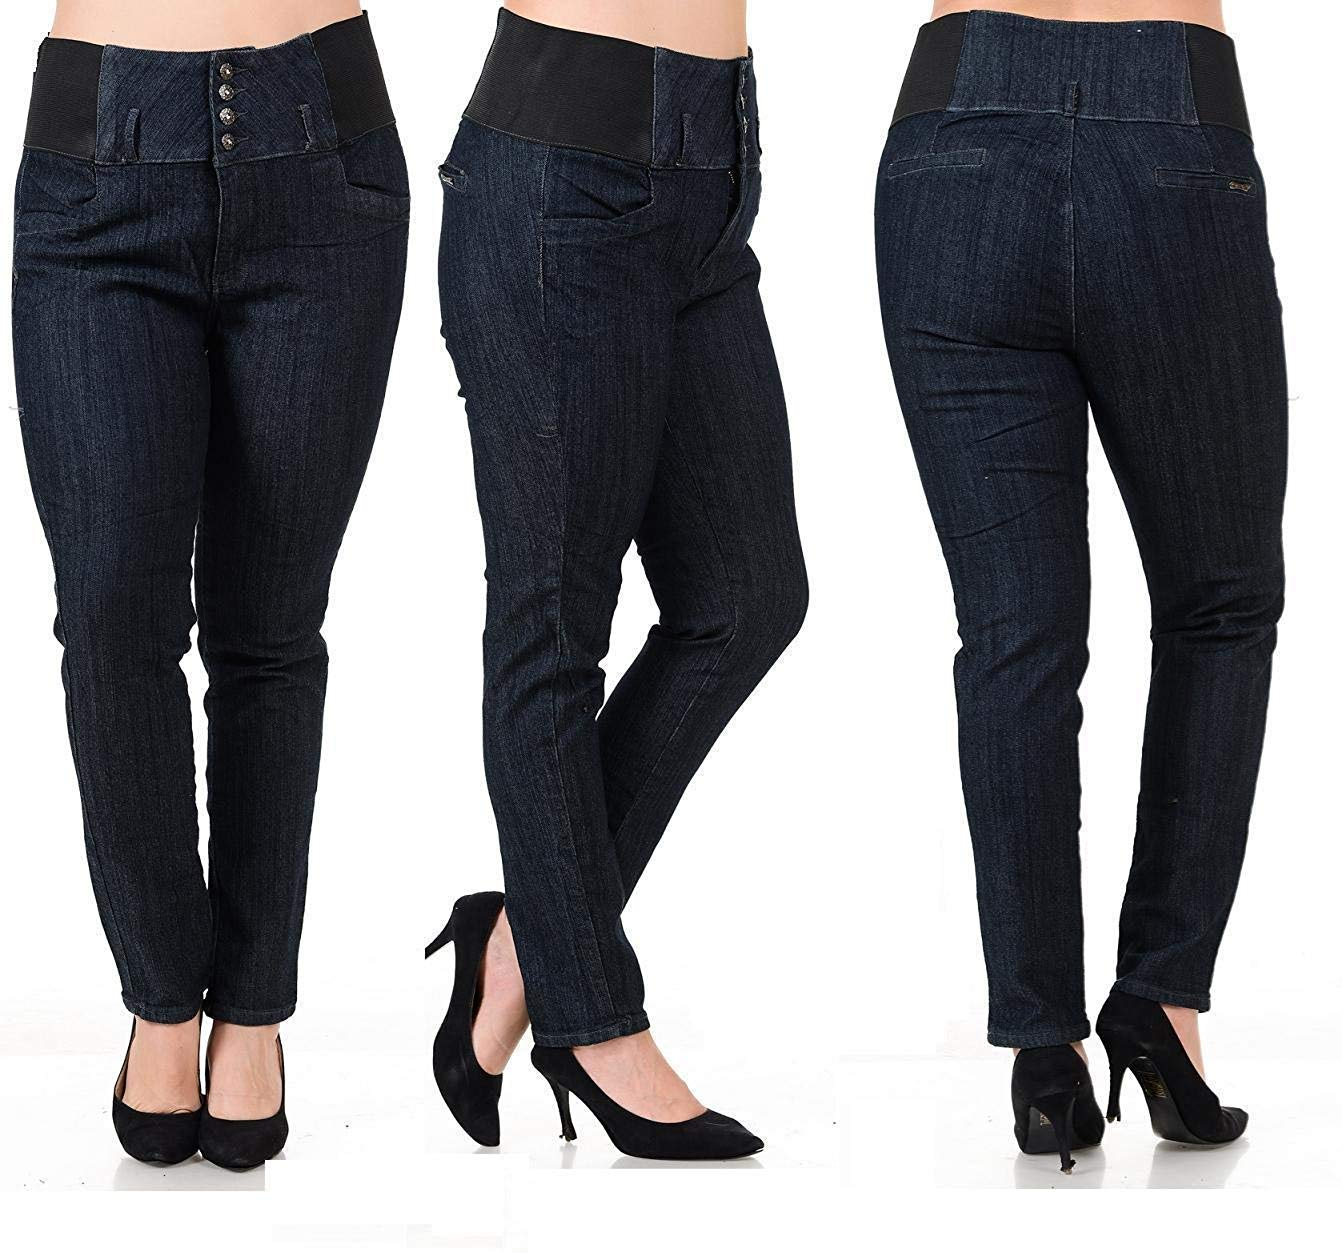 BLA Premium Womens Plus Size Stretch Pregnancy Maternity Black Denim Jeans Pants (16-P)